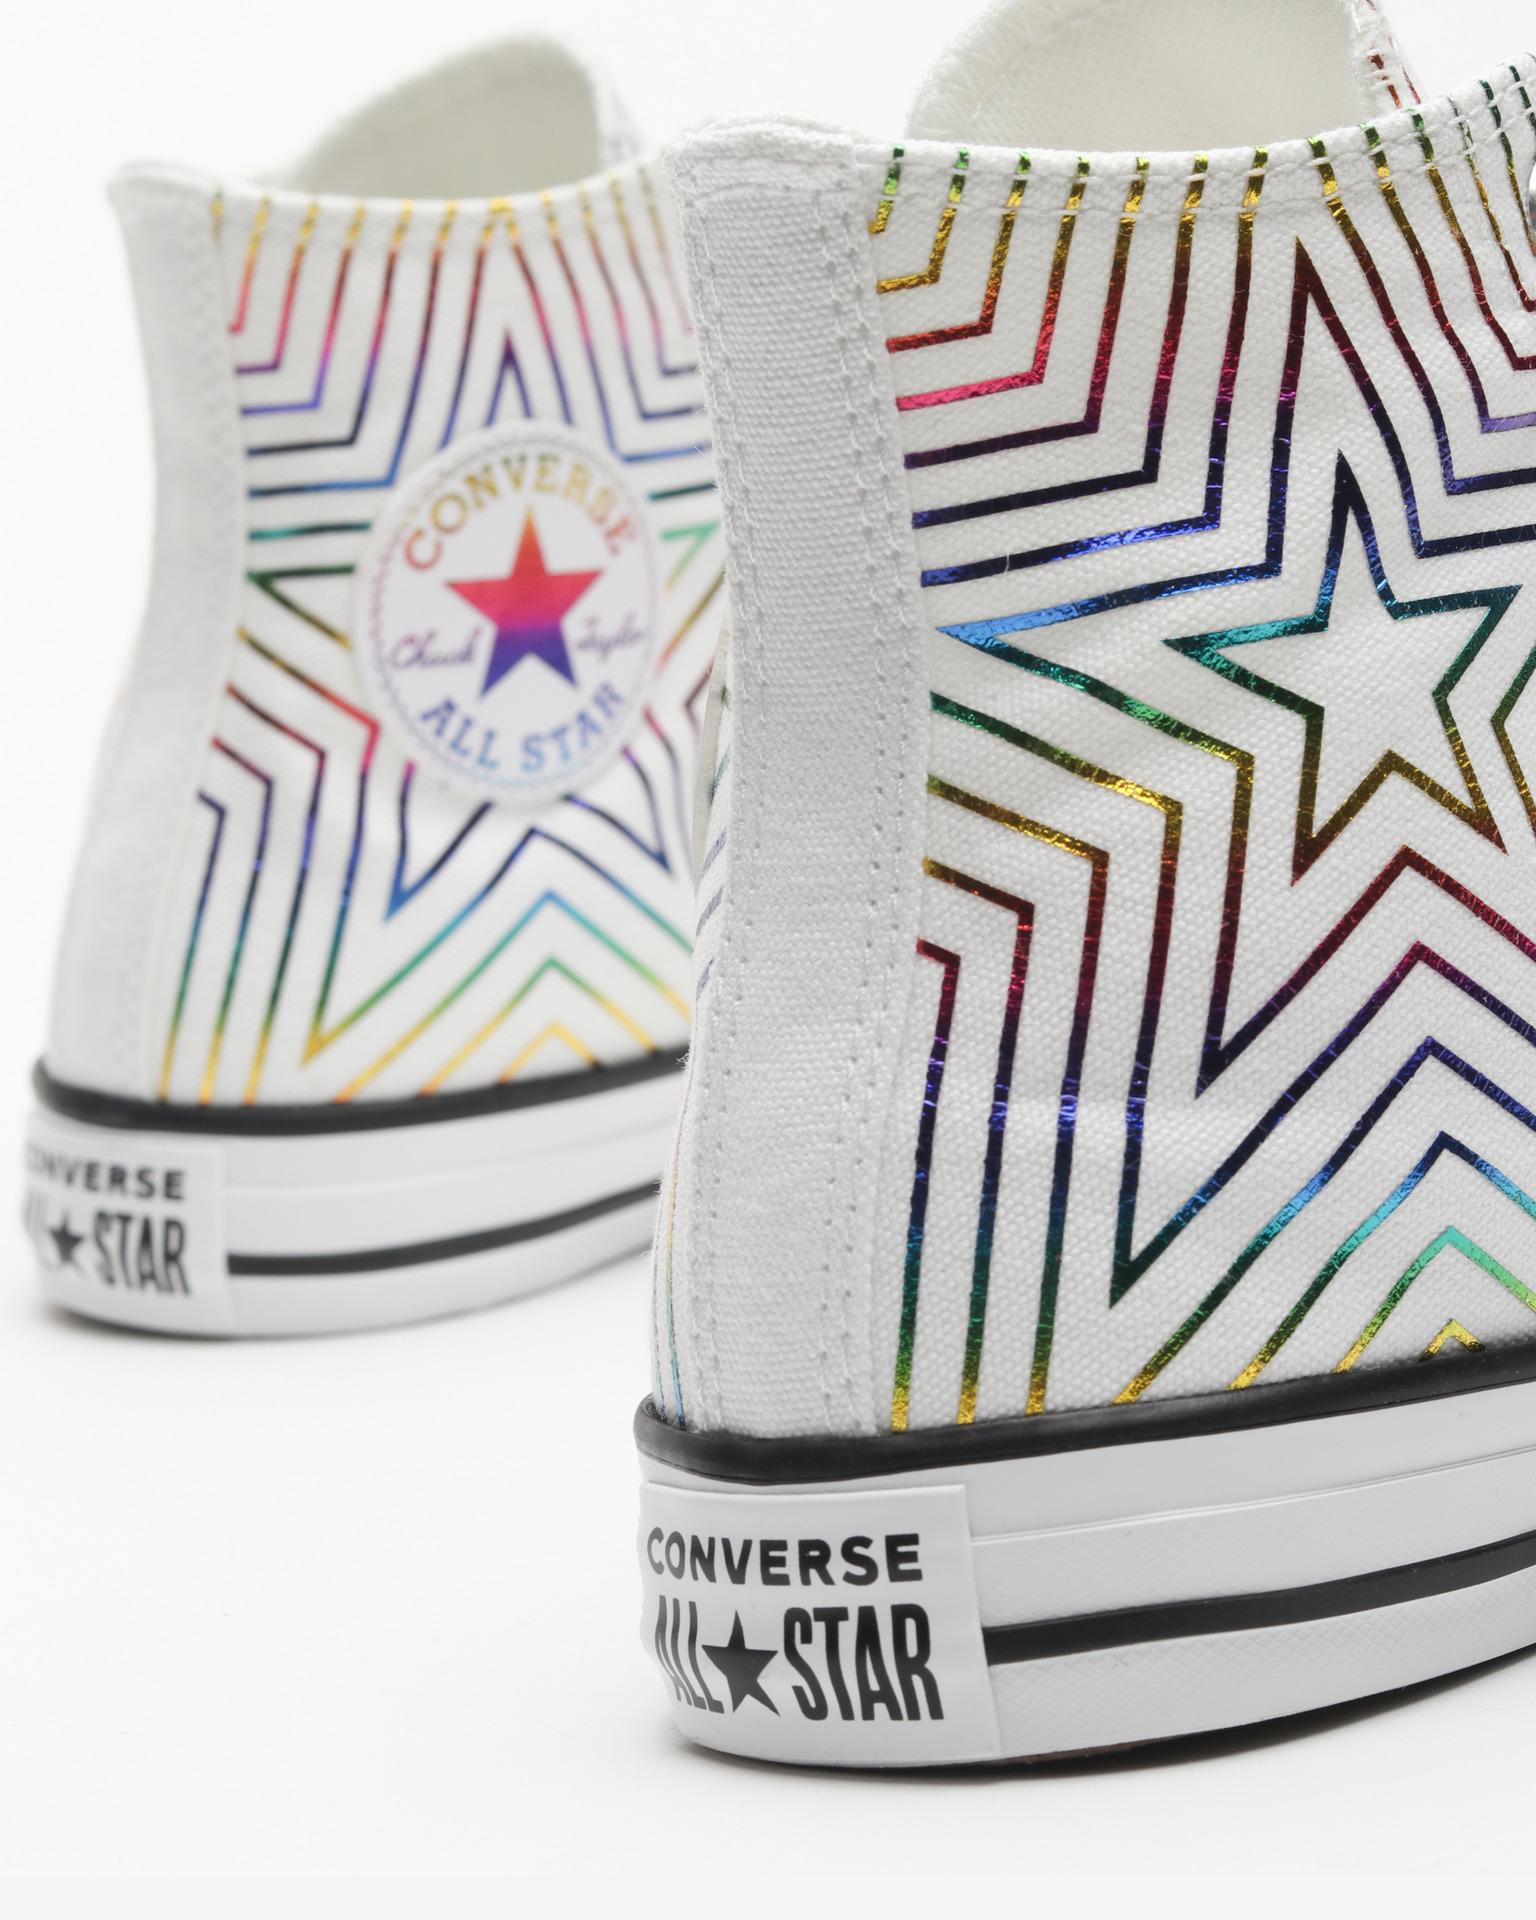 Chuck Taylor All Star Sneakers Bibloo.com